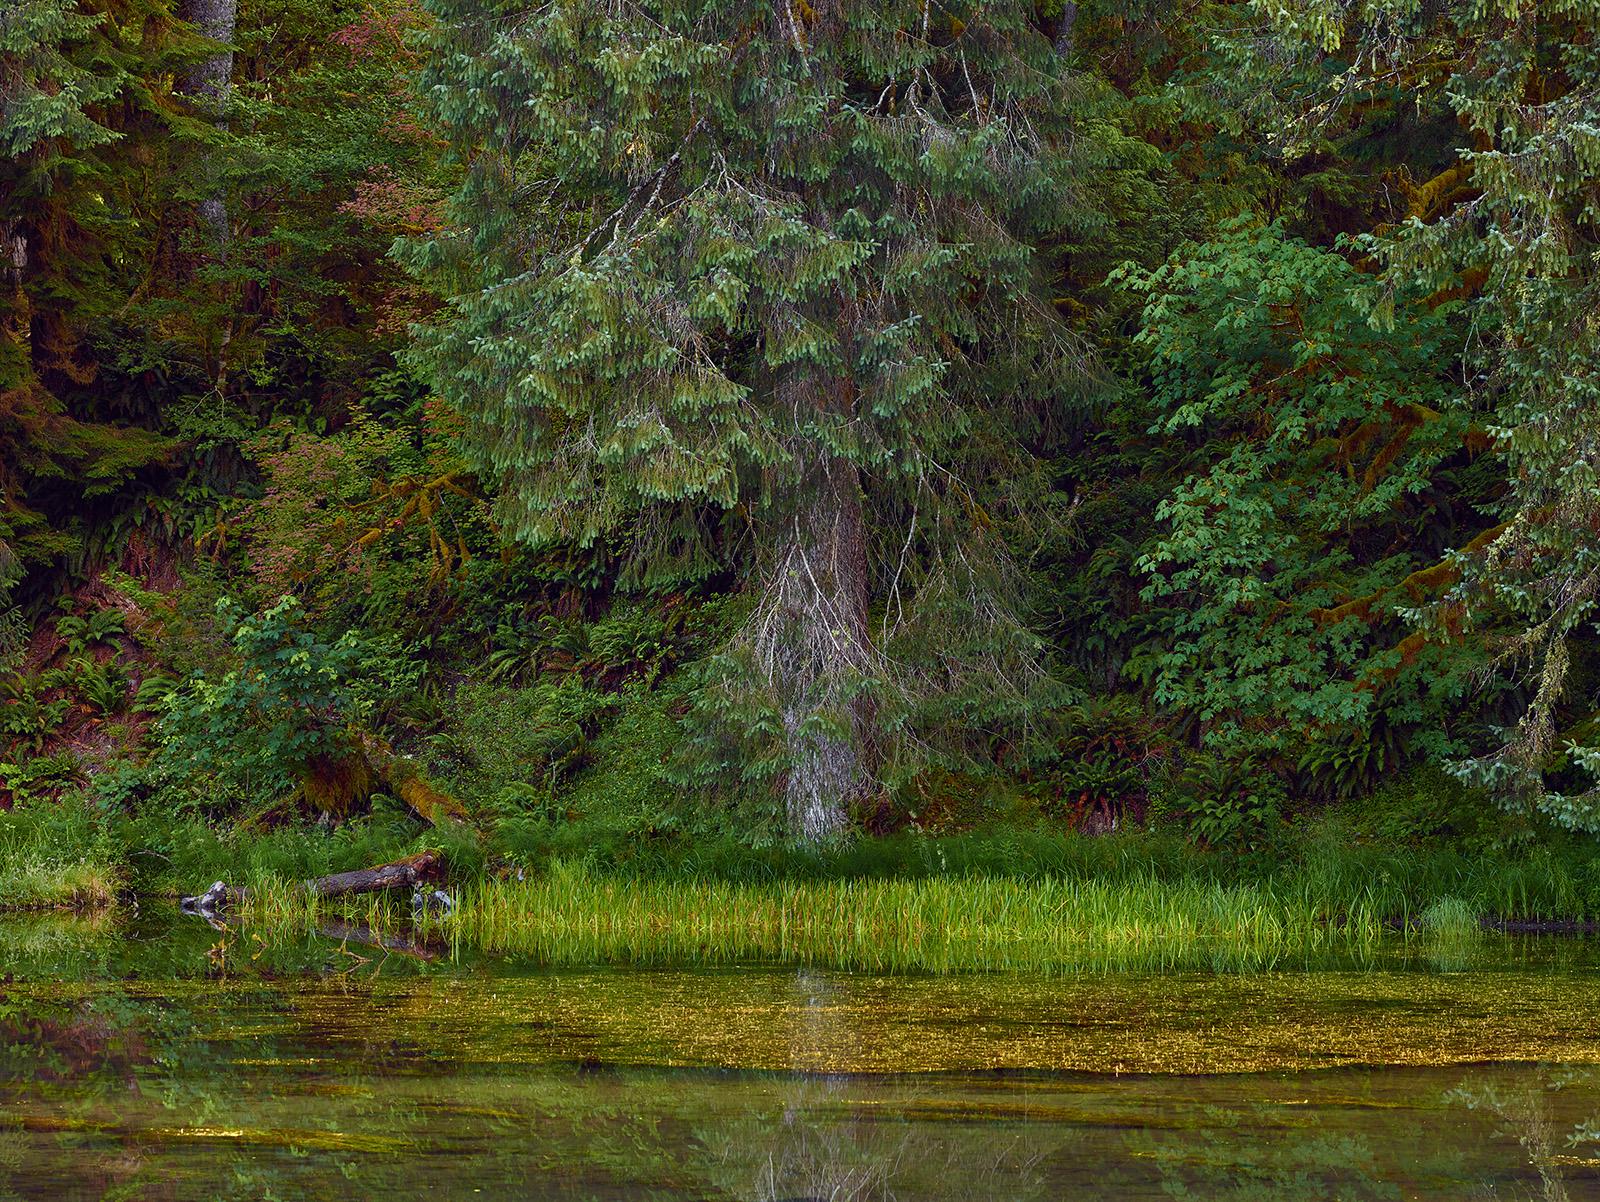 Olymipic National Park by jimban in Regular Member Gallery